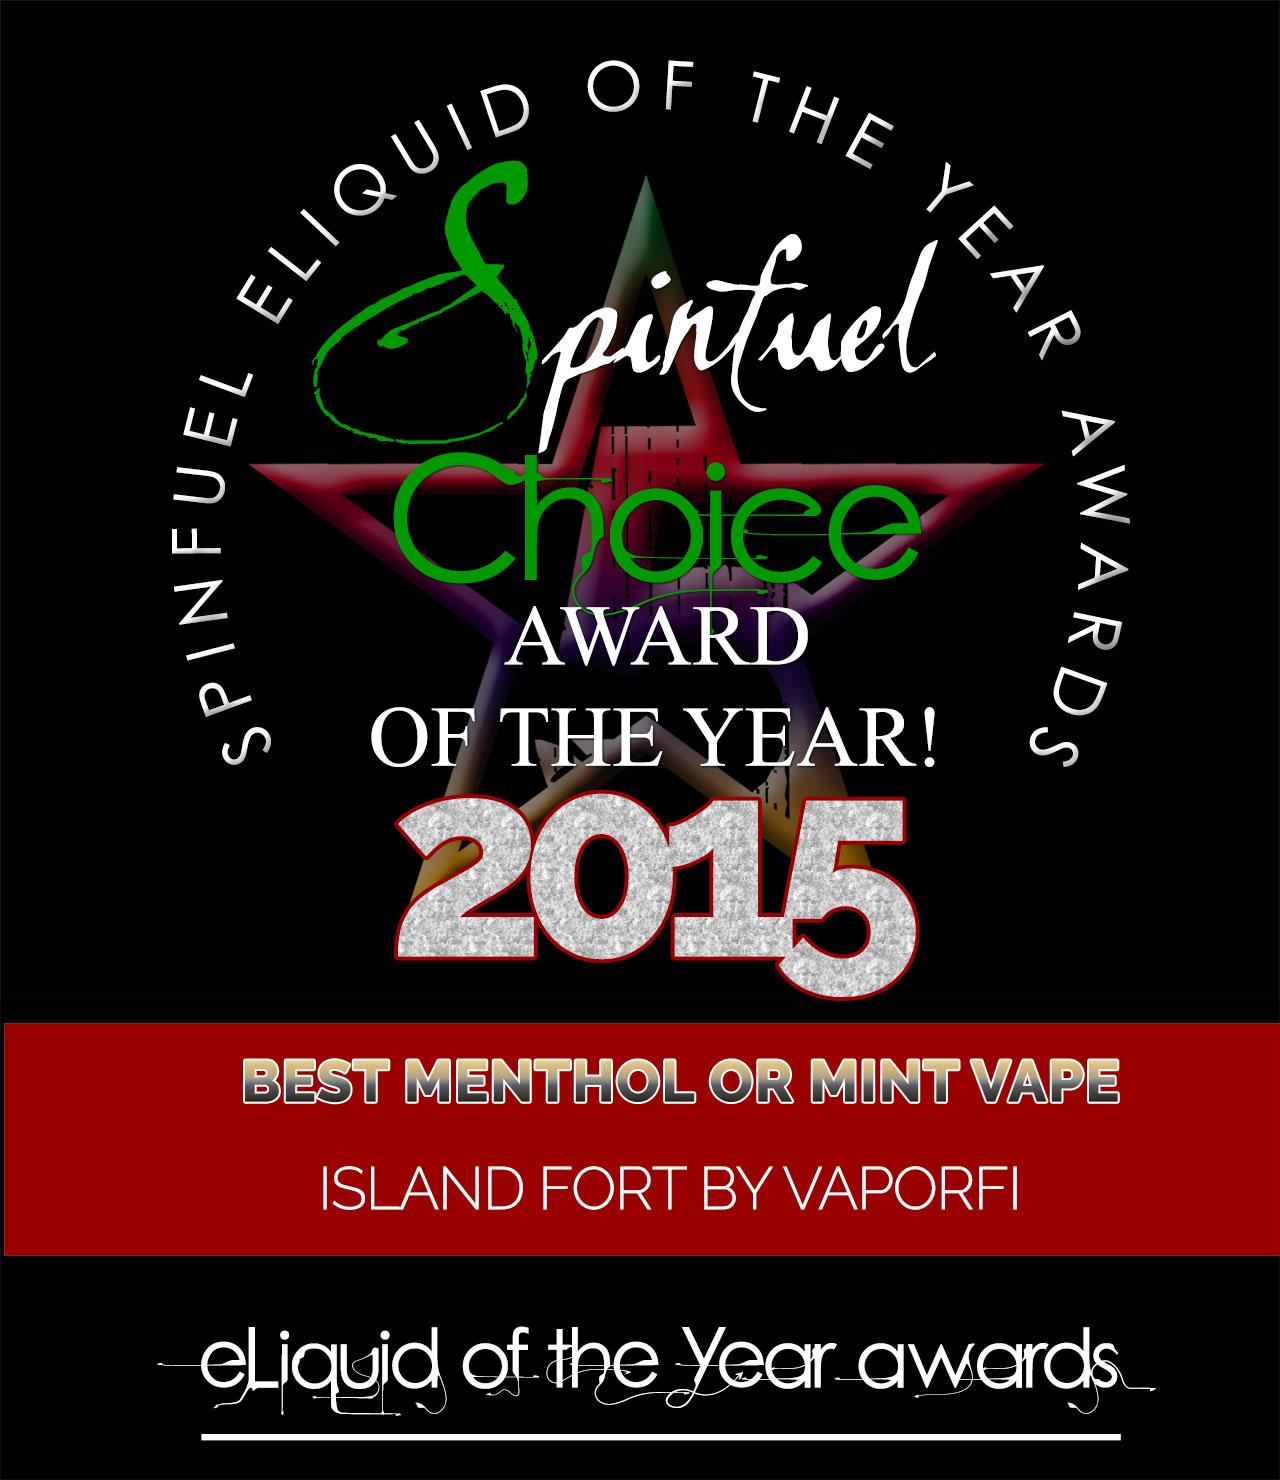 MENTHOL-MINT-ISLAND-VAPORFI - Spinfuel Choice Award 2015